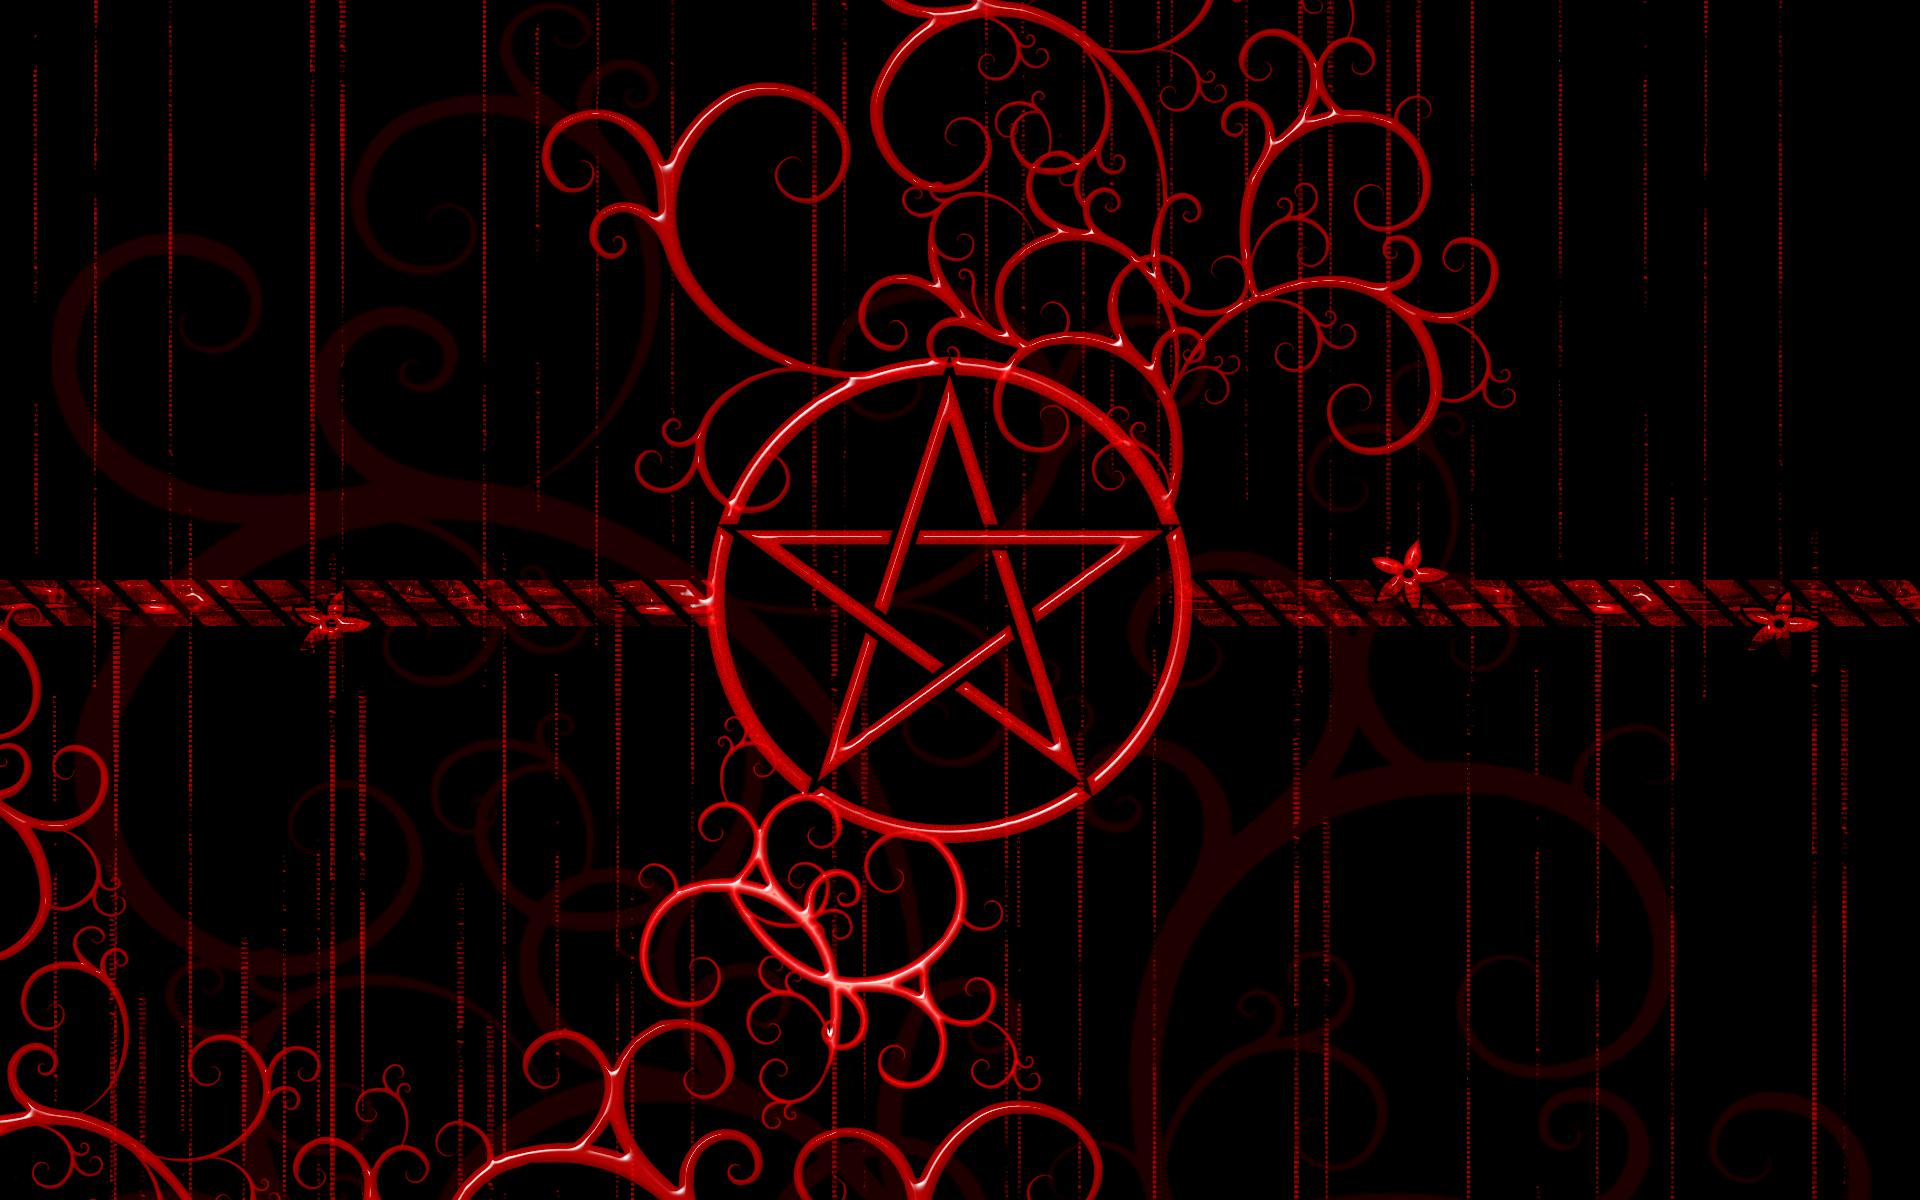 dark horror evil symbol satan penta star wallpaper background 1920x1200